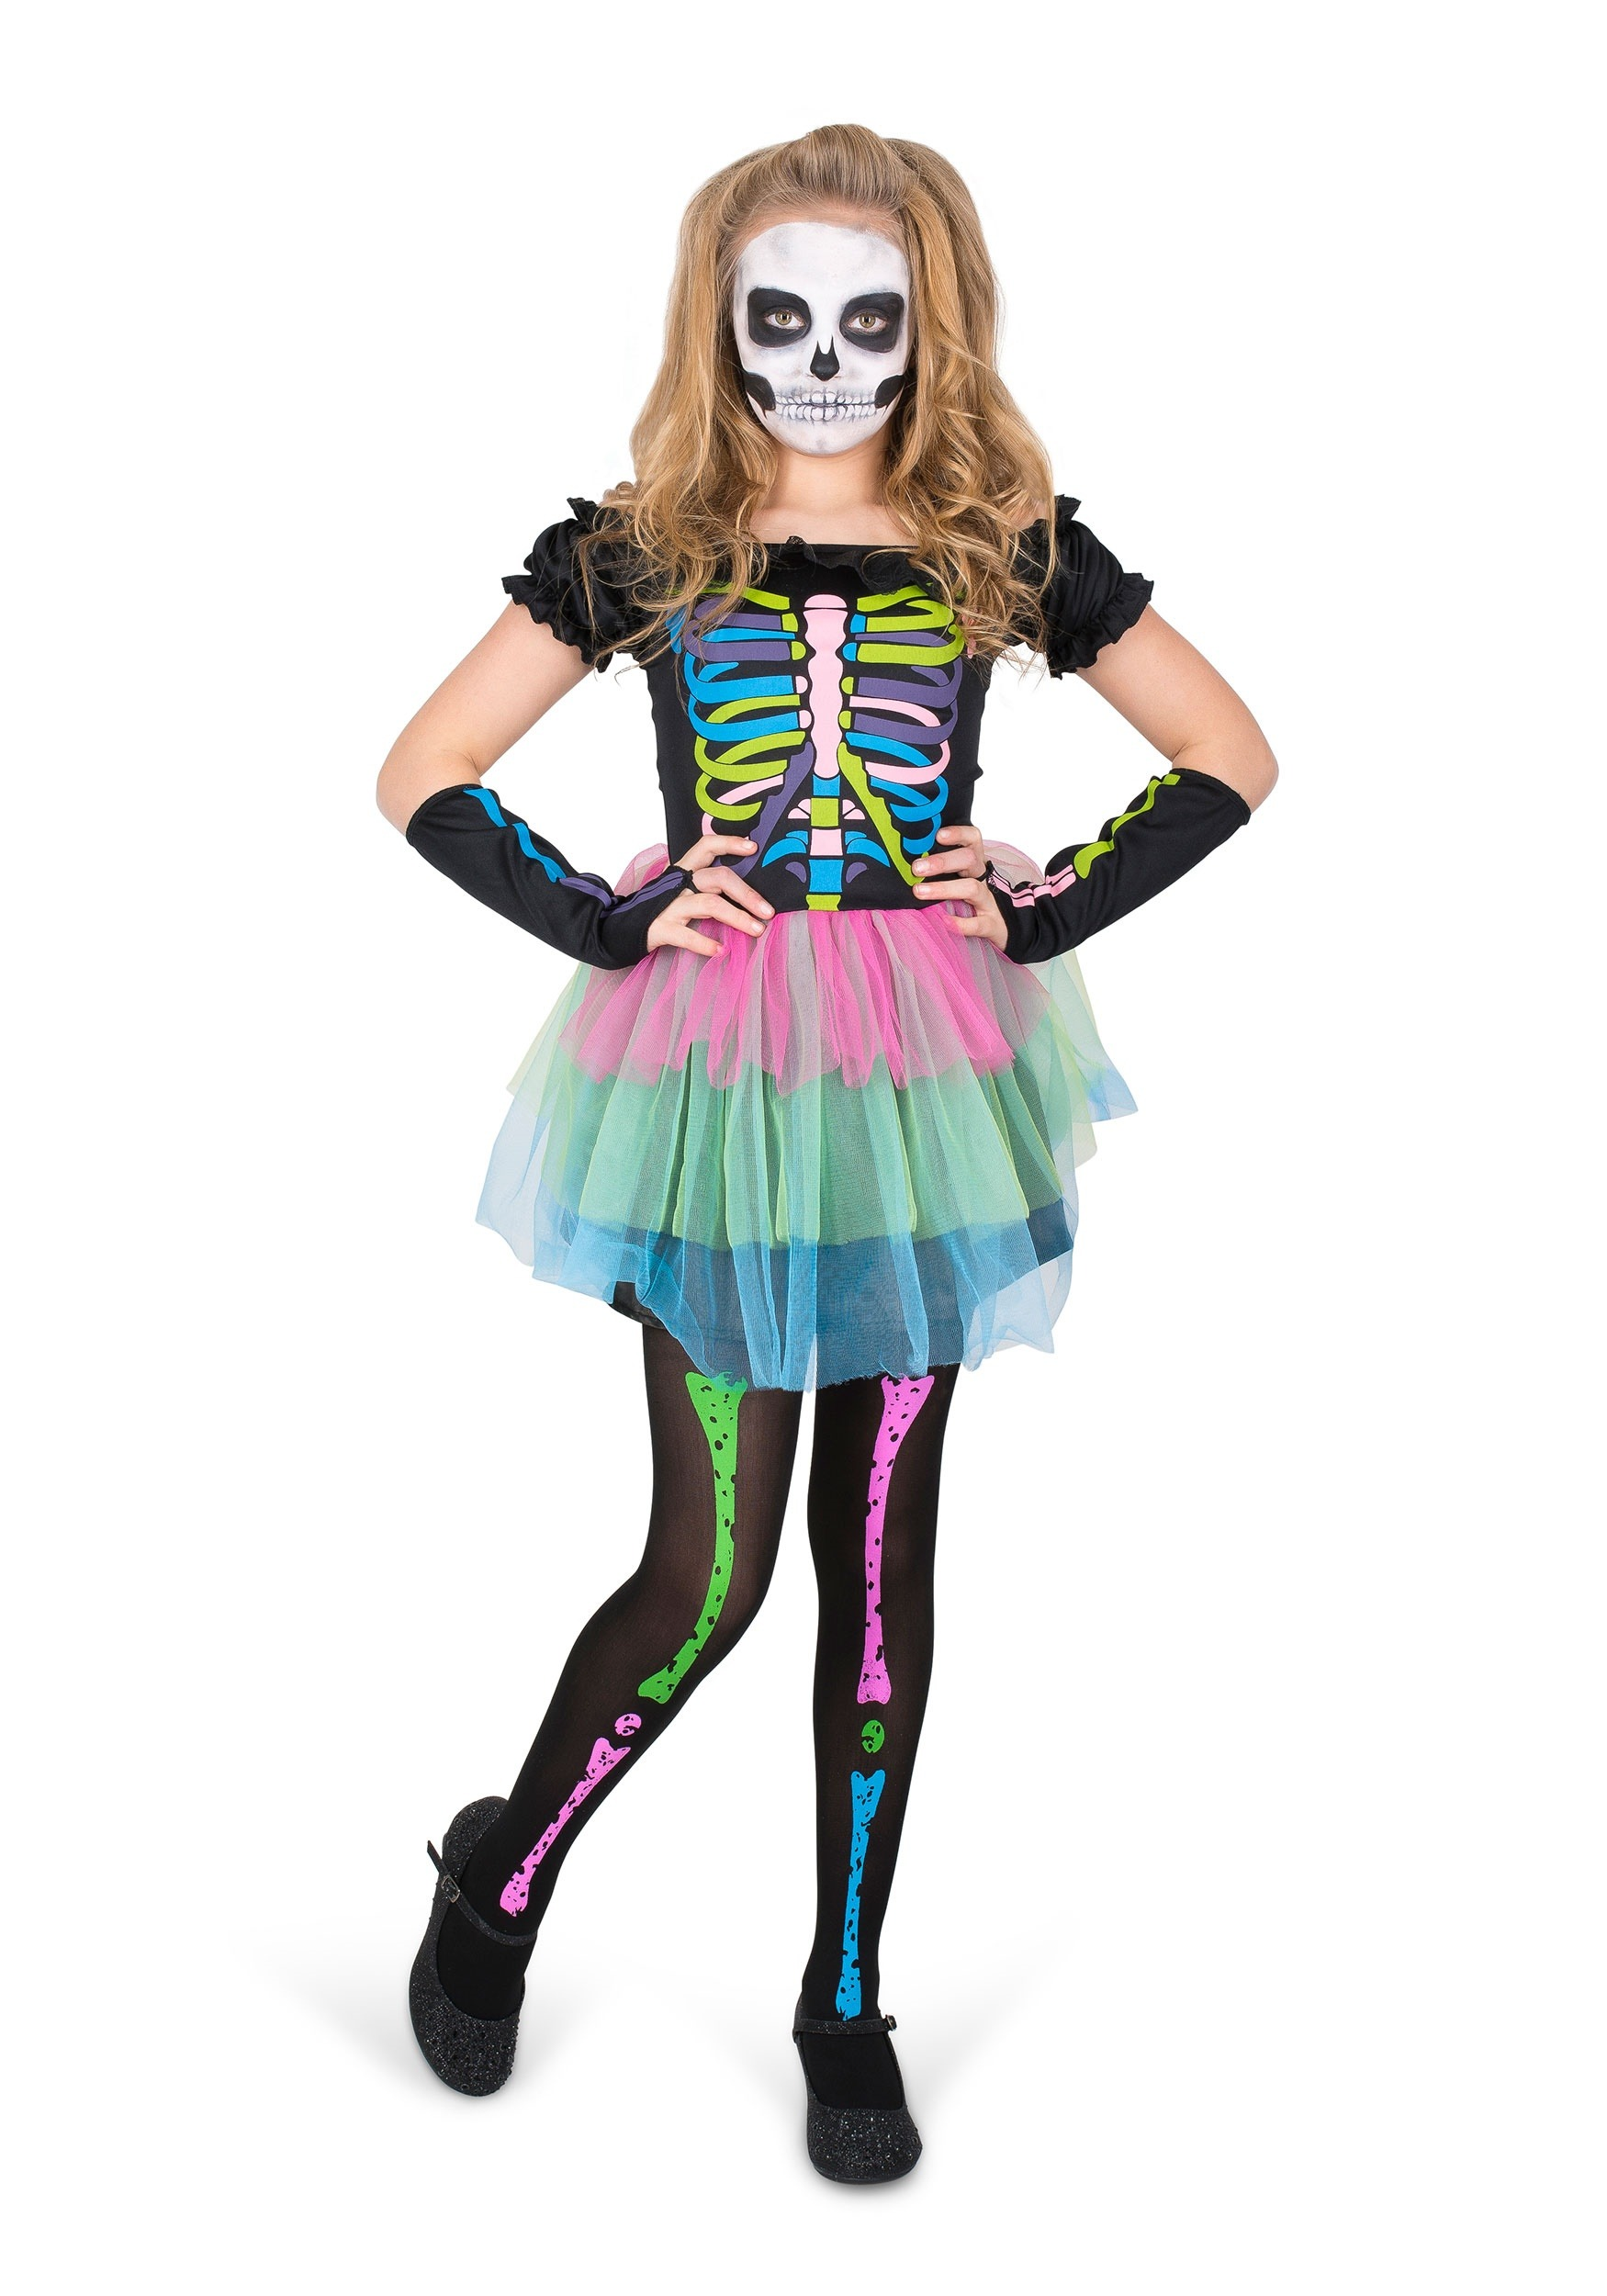 d95f97df60281 rainbow-skeleton-girl-costume.jpg